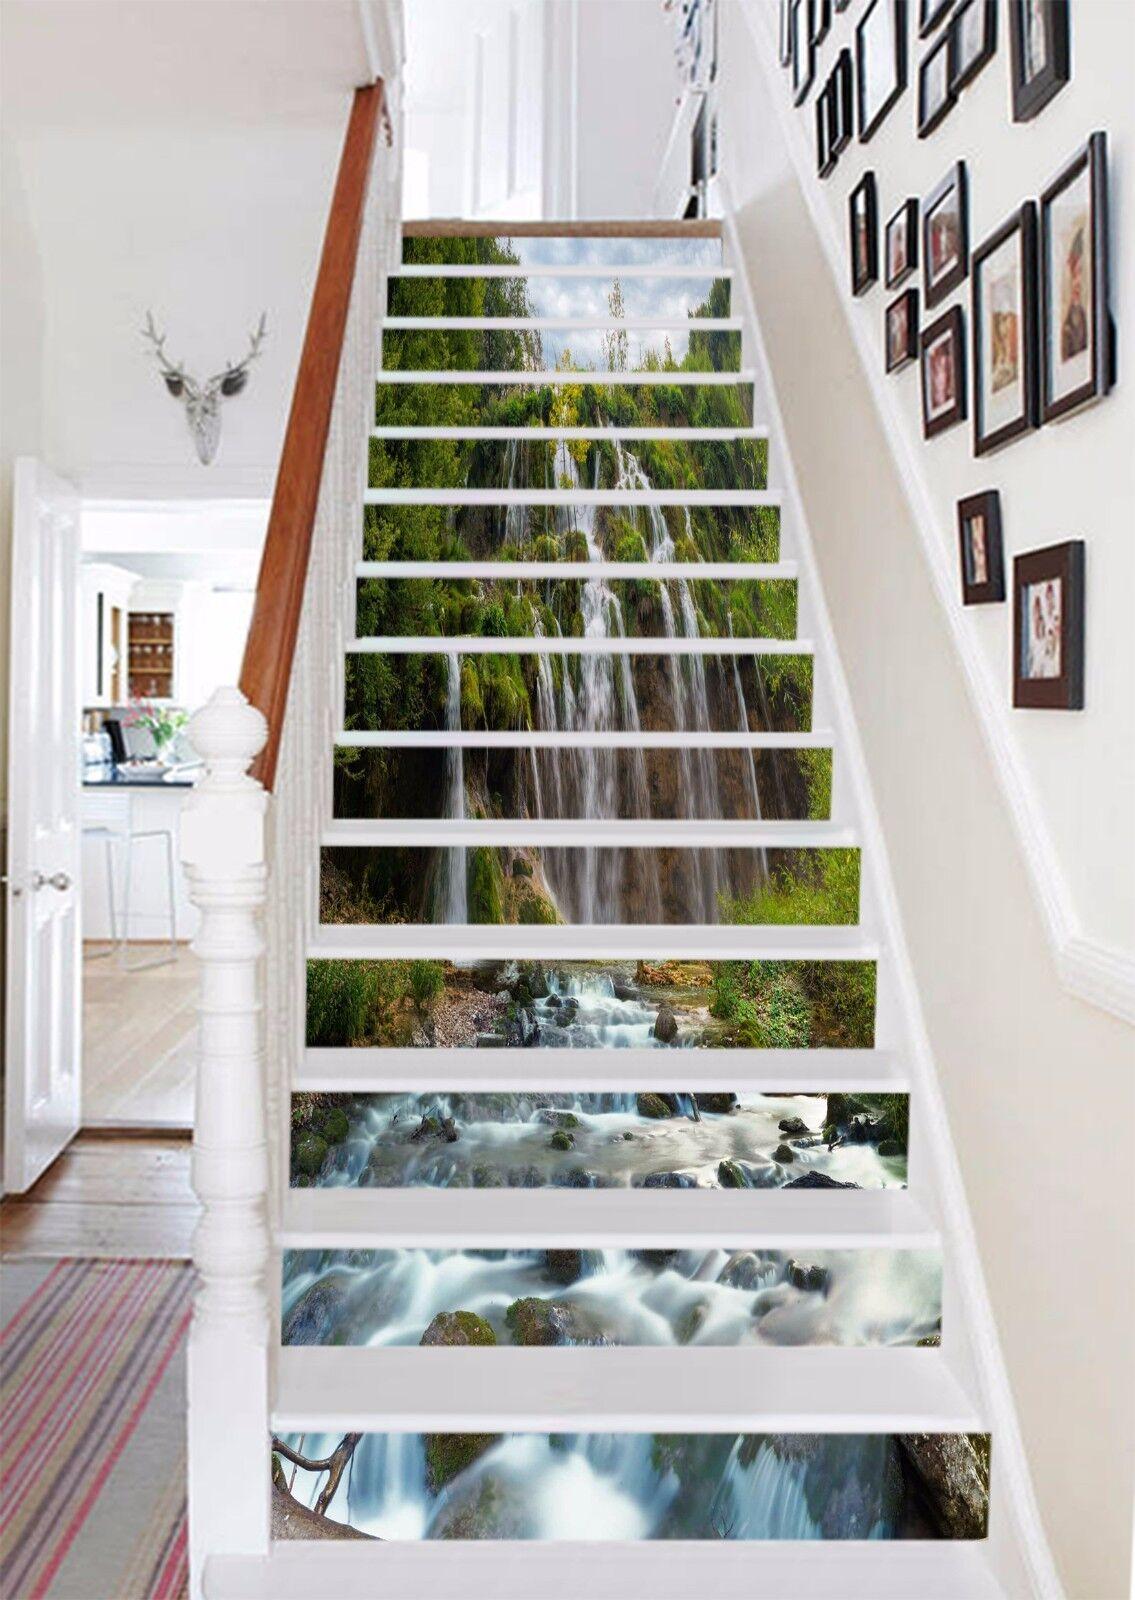 3D Cascade River Stair Risers Decoration Photo Mural Vinyl Decal Wallpaper AU